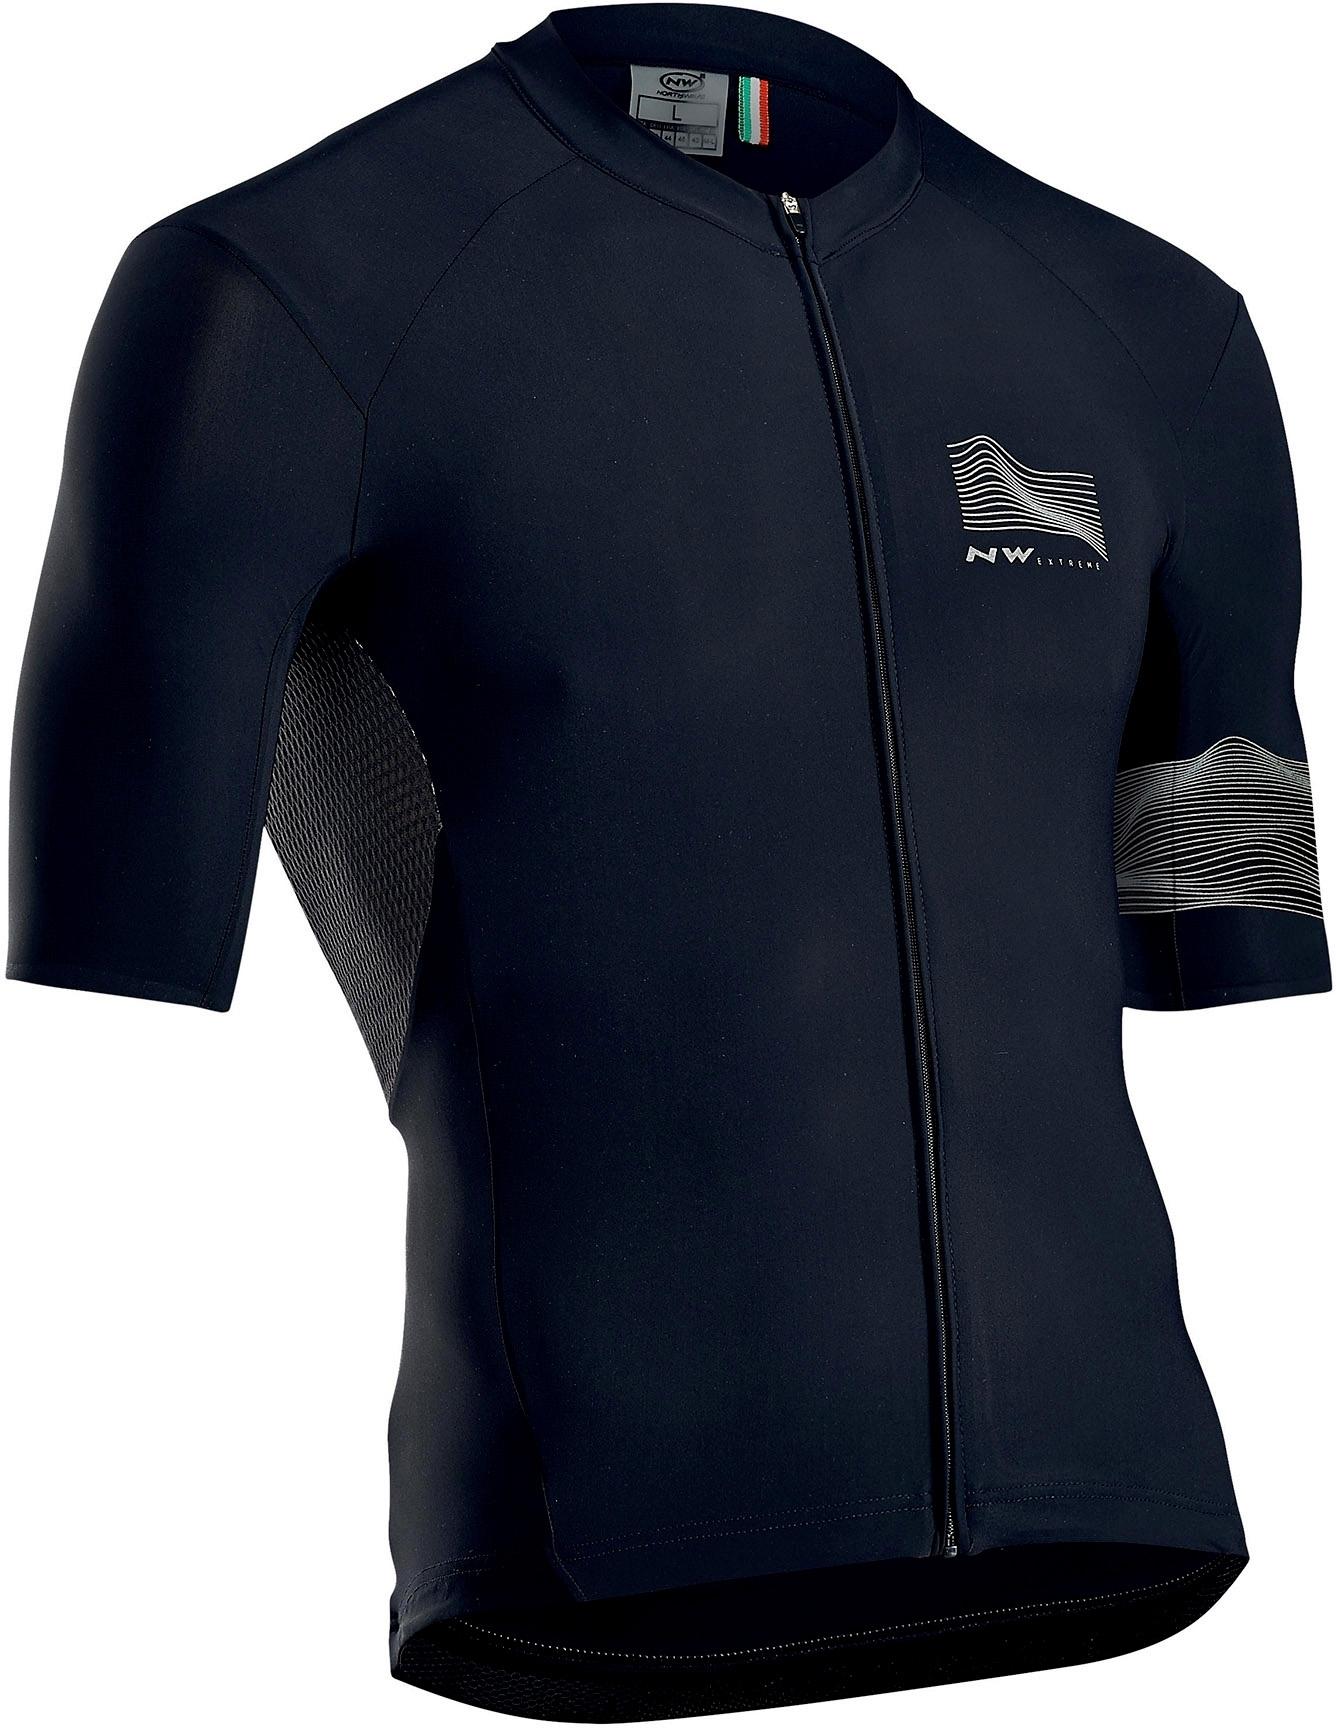 Best price Northwave Man bike jersey short sleeves EXTREME 3